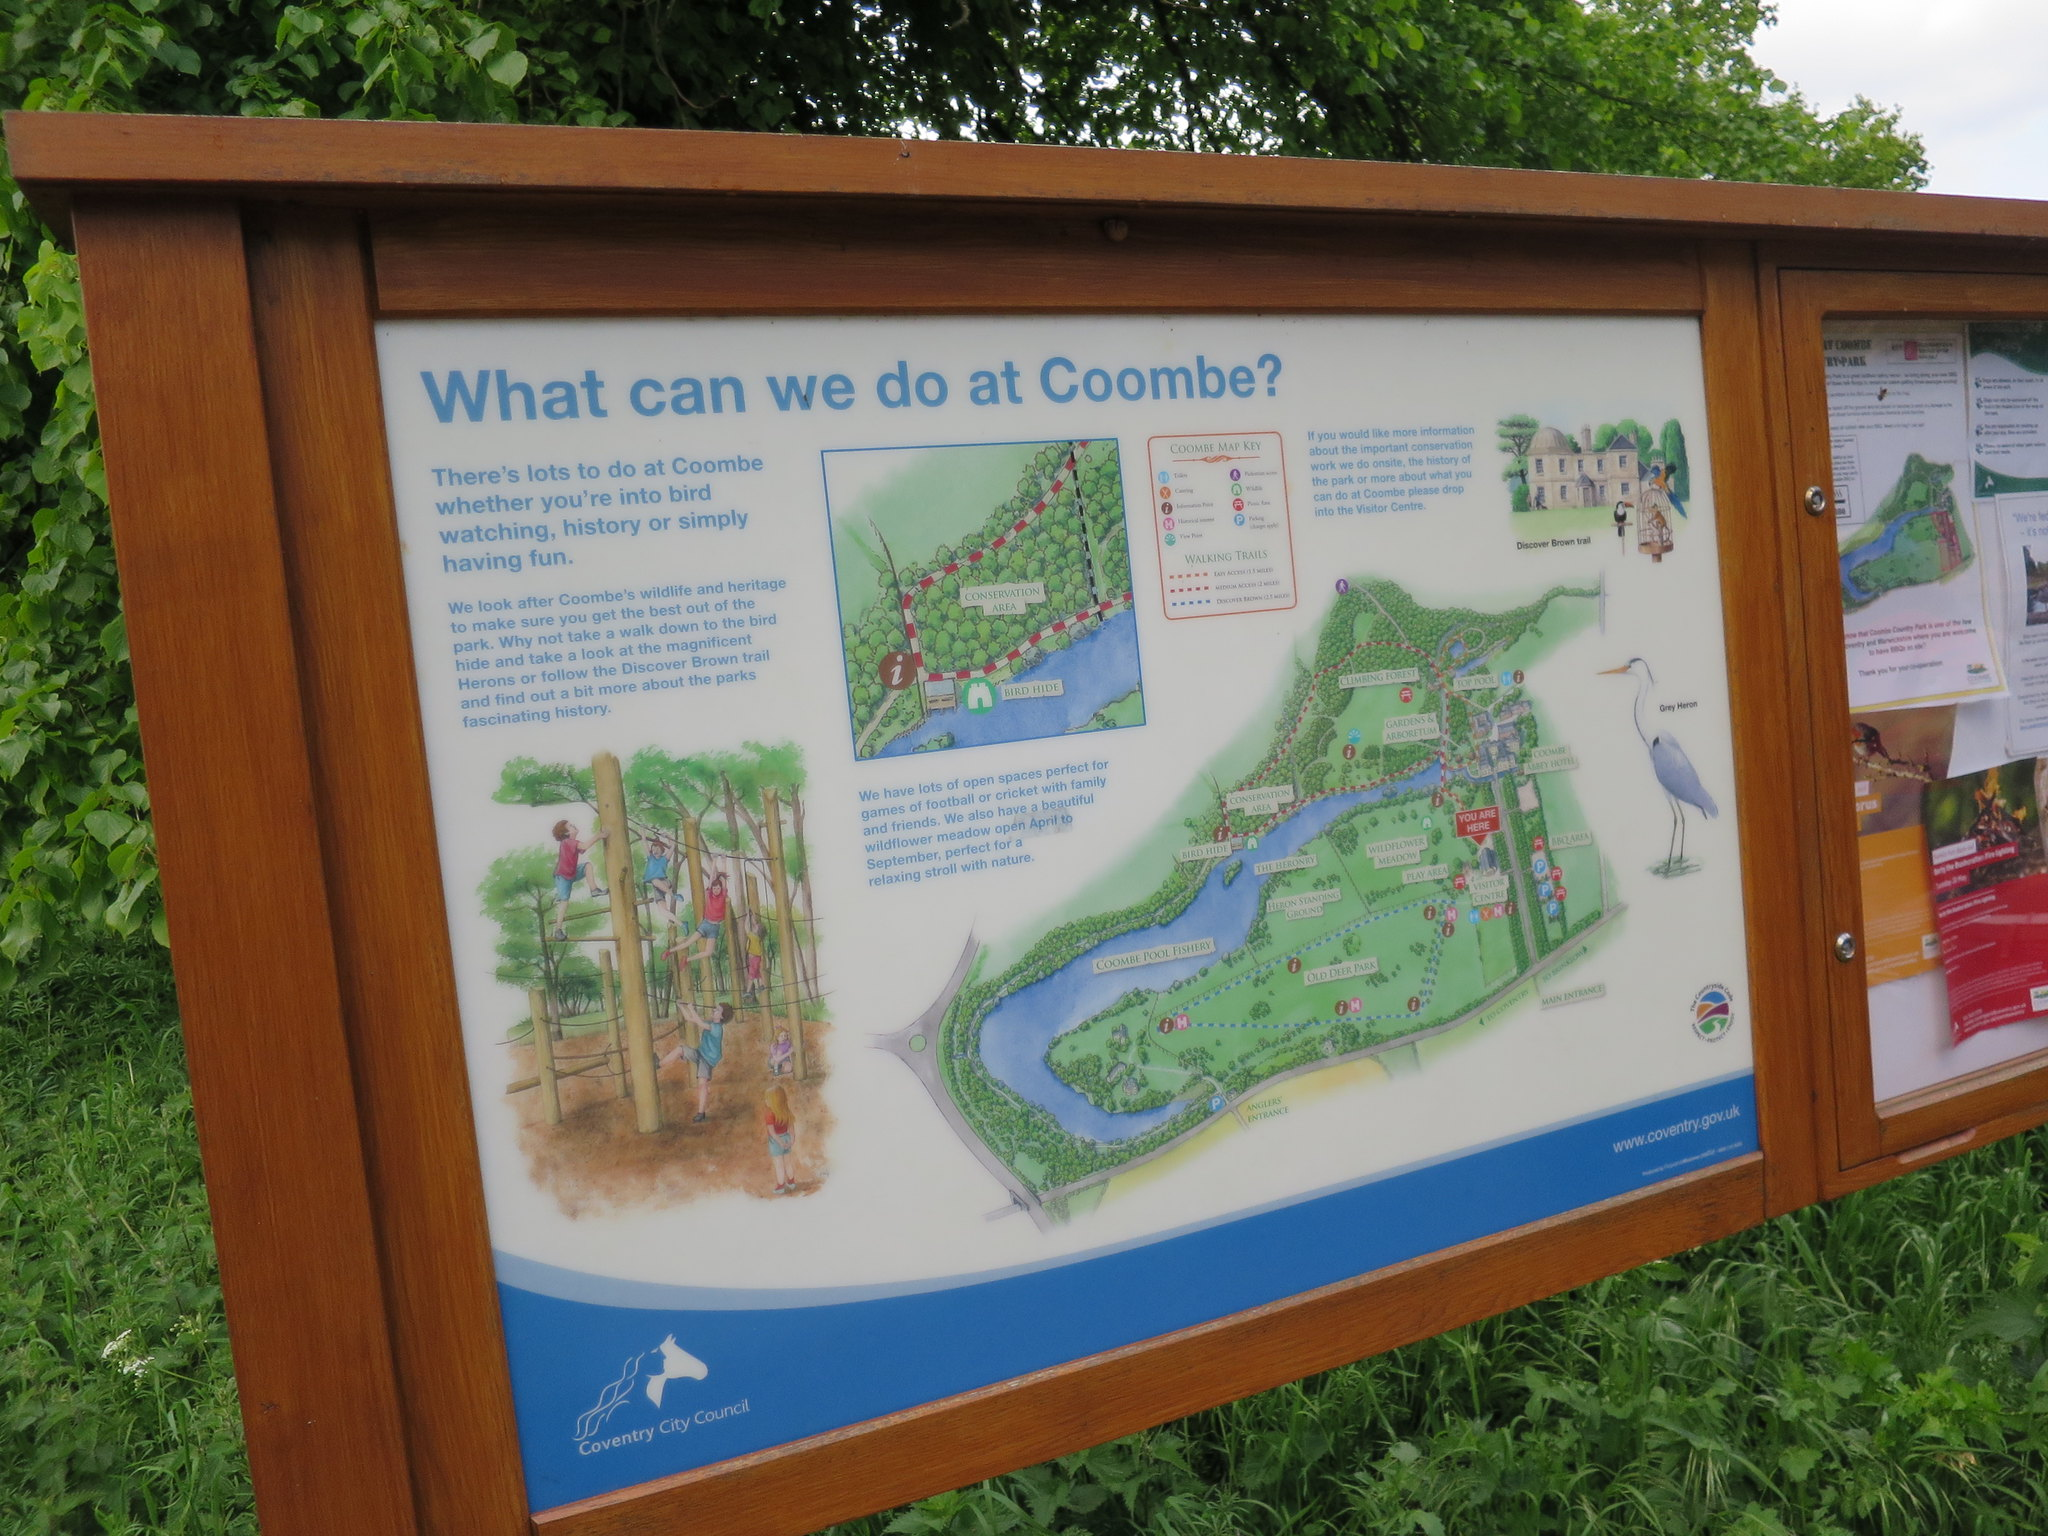 Coombe Country Park, Hello Im Clo, Culture Blogger 01